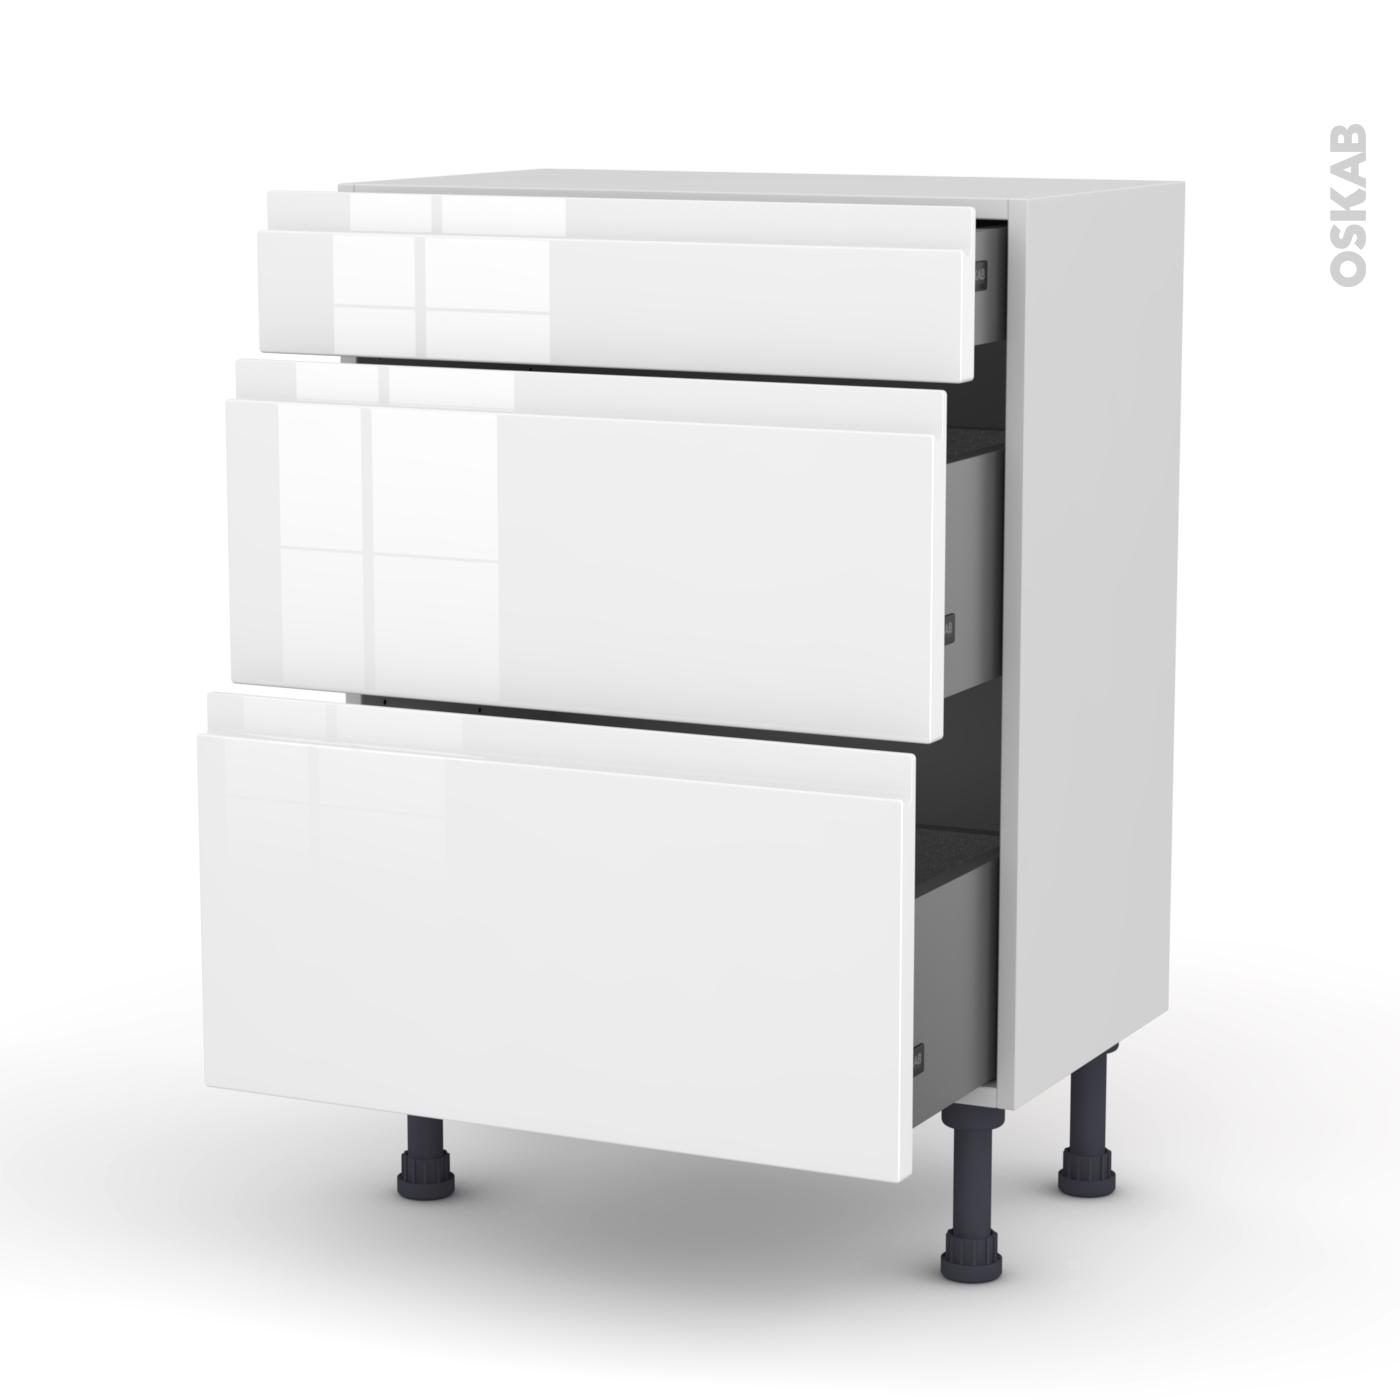 Meuble de cuisine Bas IPOMA Blanc brillant, 12 tiroirs, L12 x H12 x P127 cm